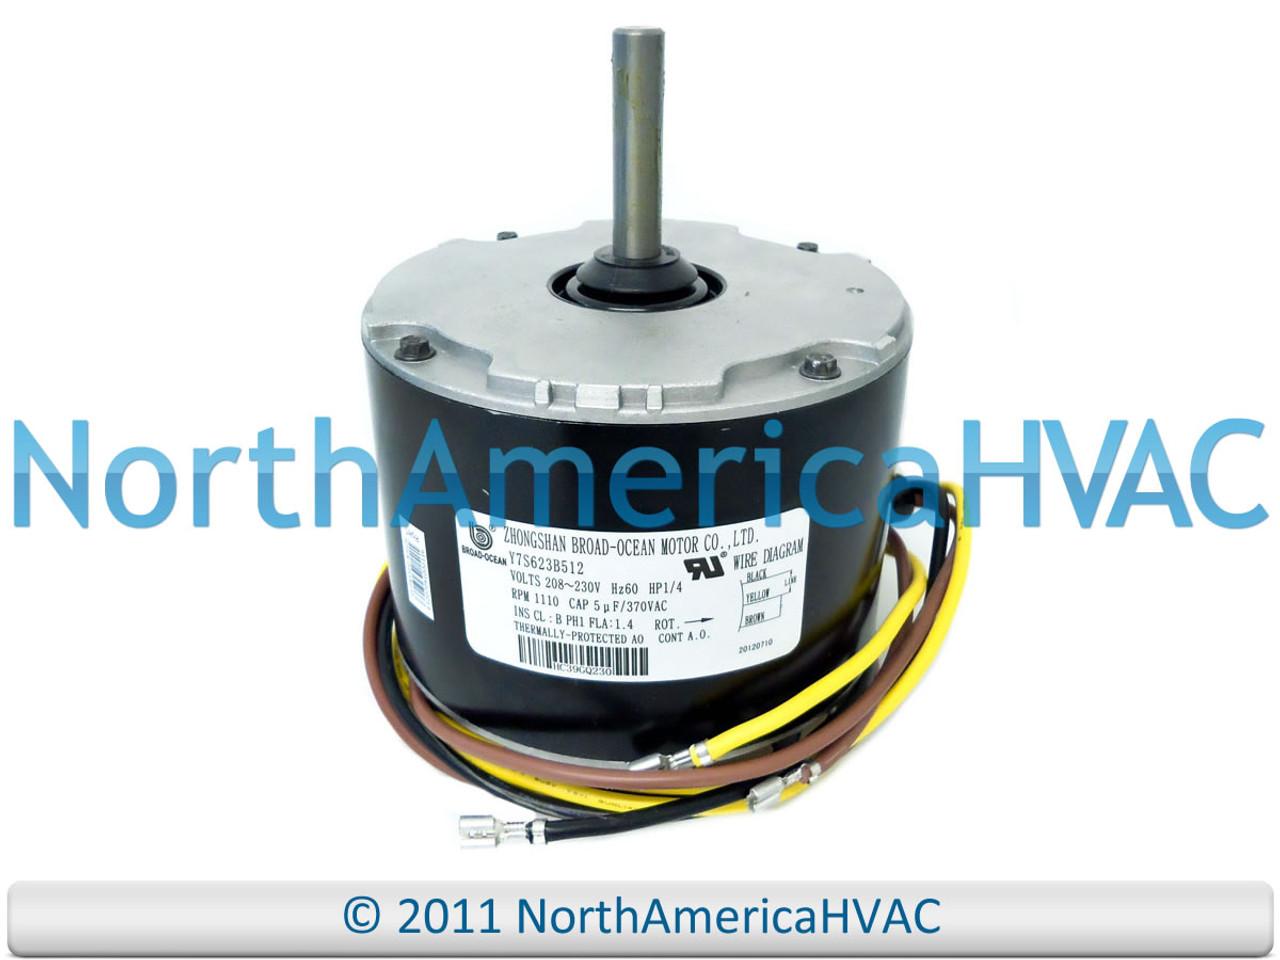 2 phase wiring condenser zhongshan broad ocean condenser fan motor 1 4 hp 208 230v  condenser fan motor 1 4 hp 208 230v